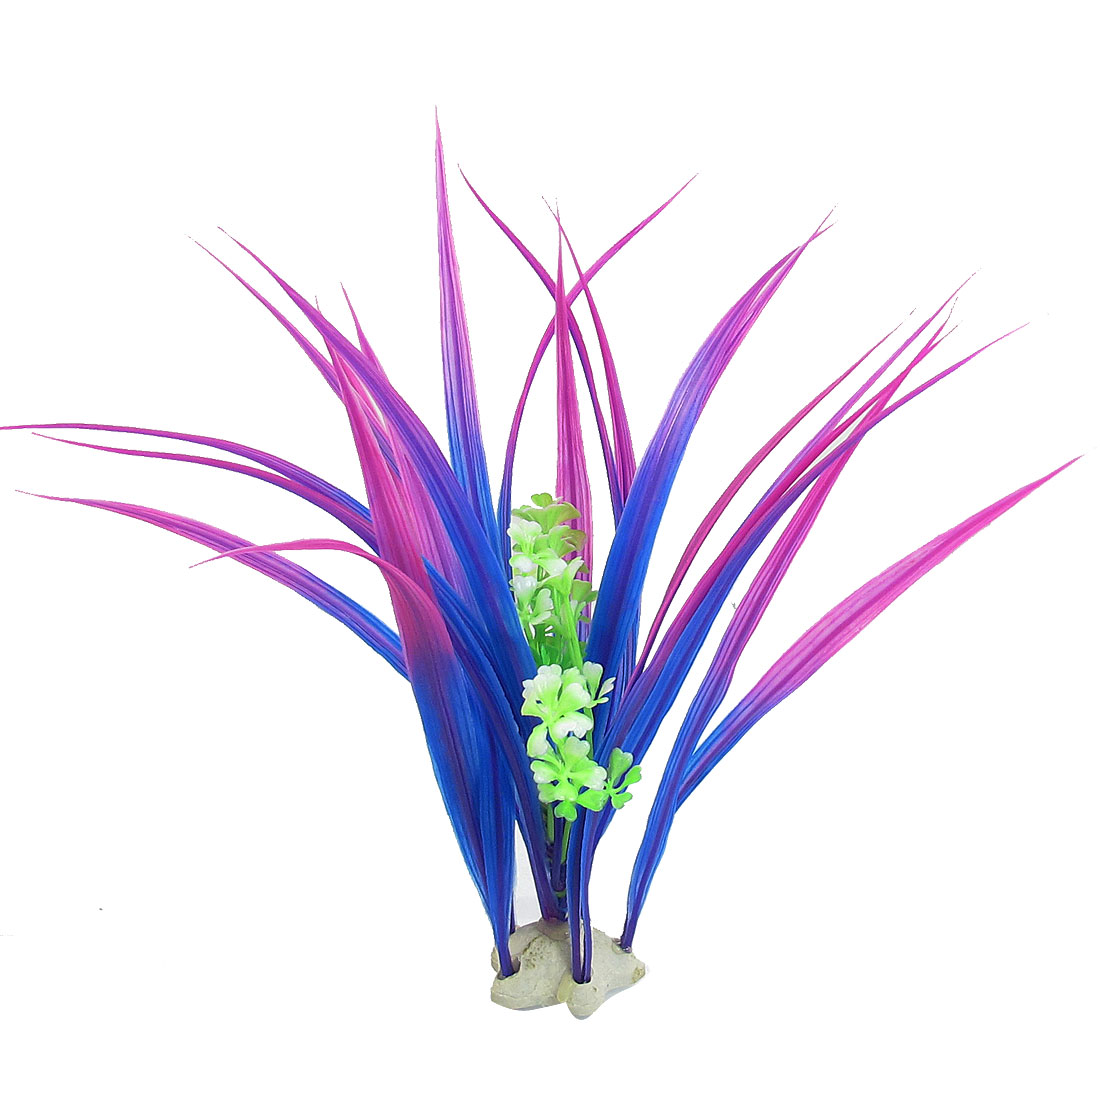 "9.8"" x 2.8"" Green Purple Manmade Plants Fish Tank Ornament w Star Base"